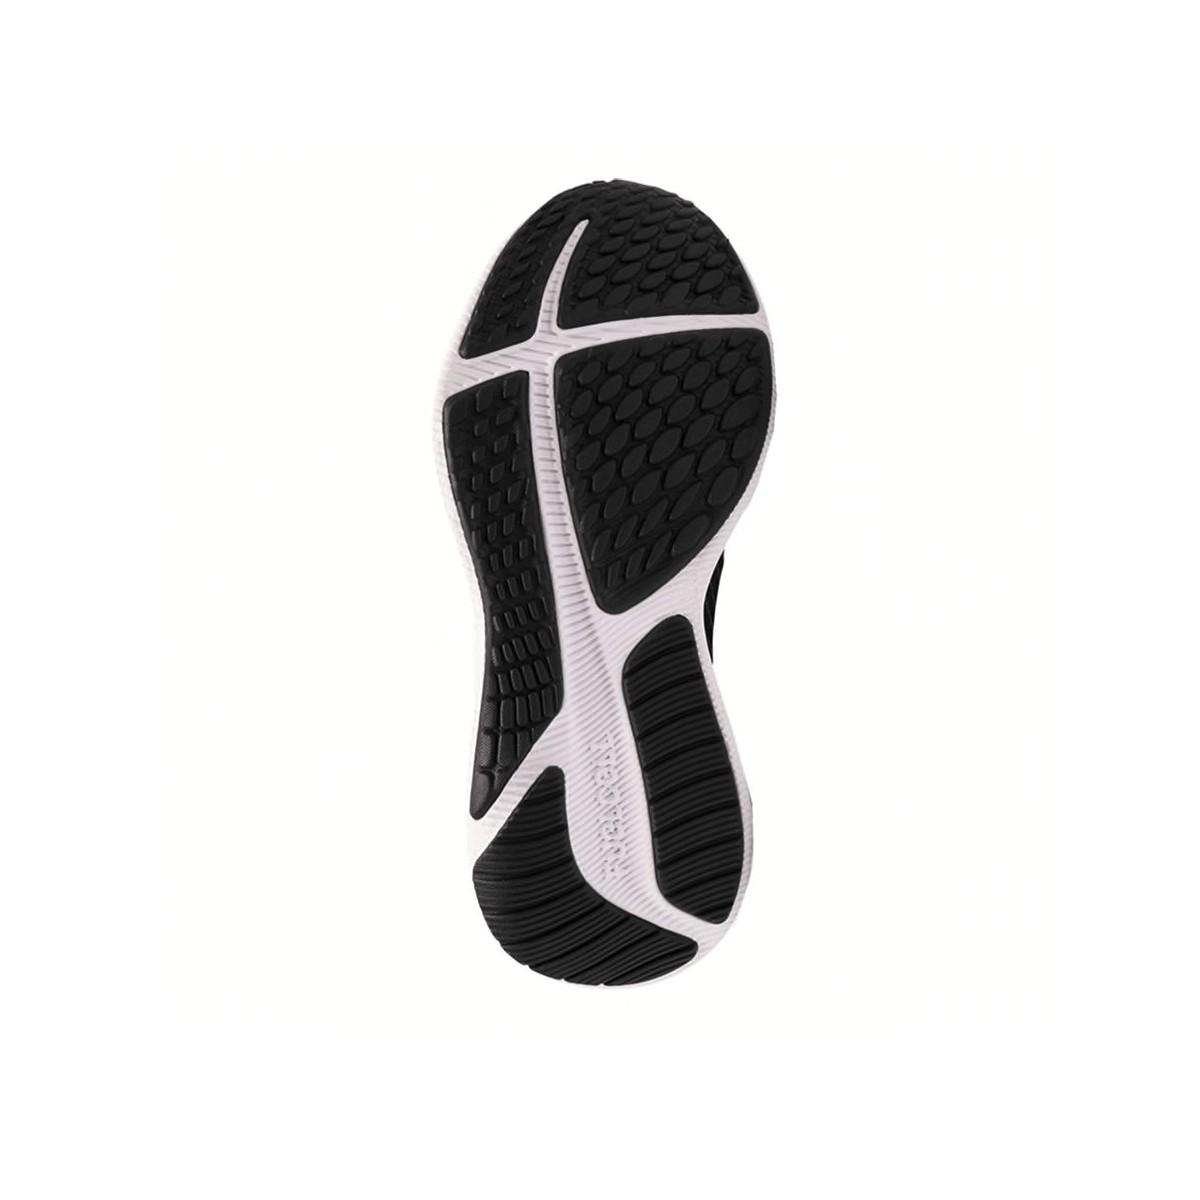 Zapatillas New Balance FuelCell Propel Gris Negro OI19